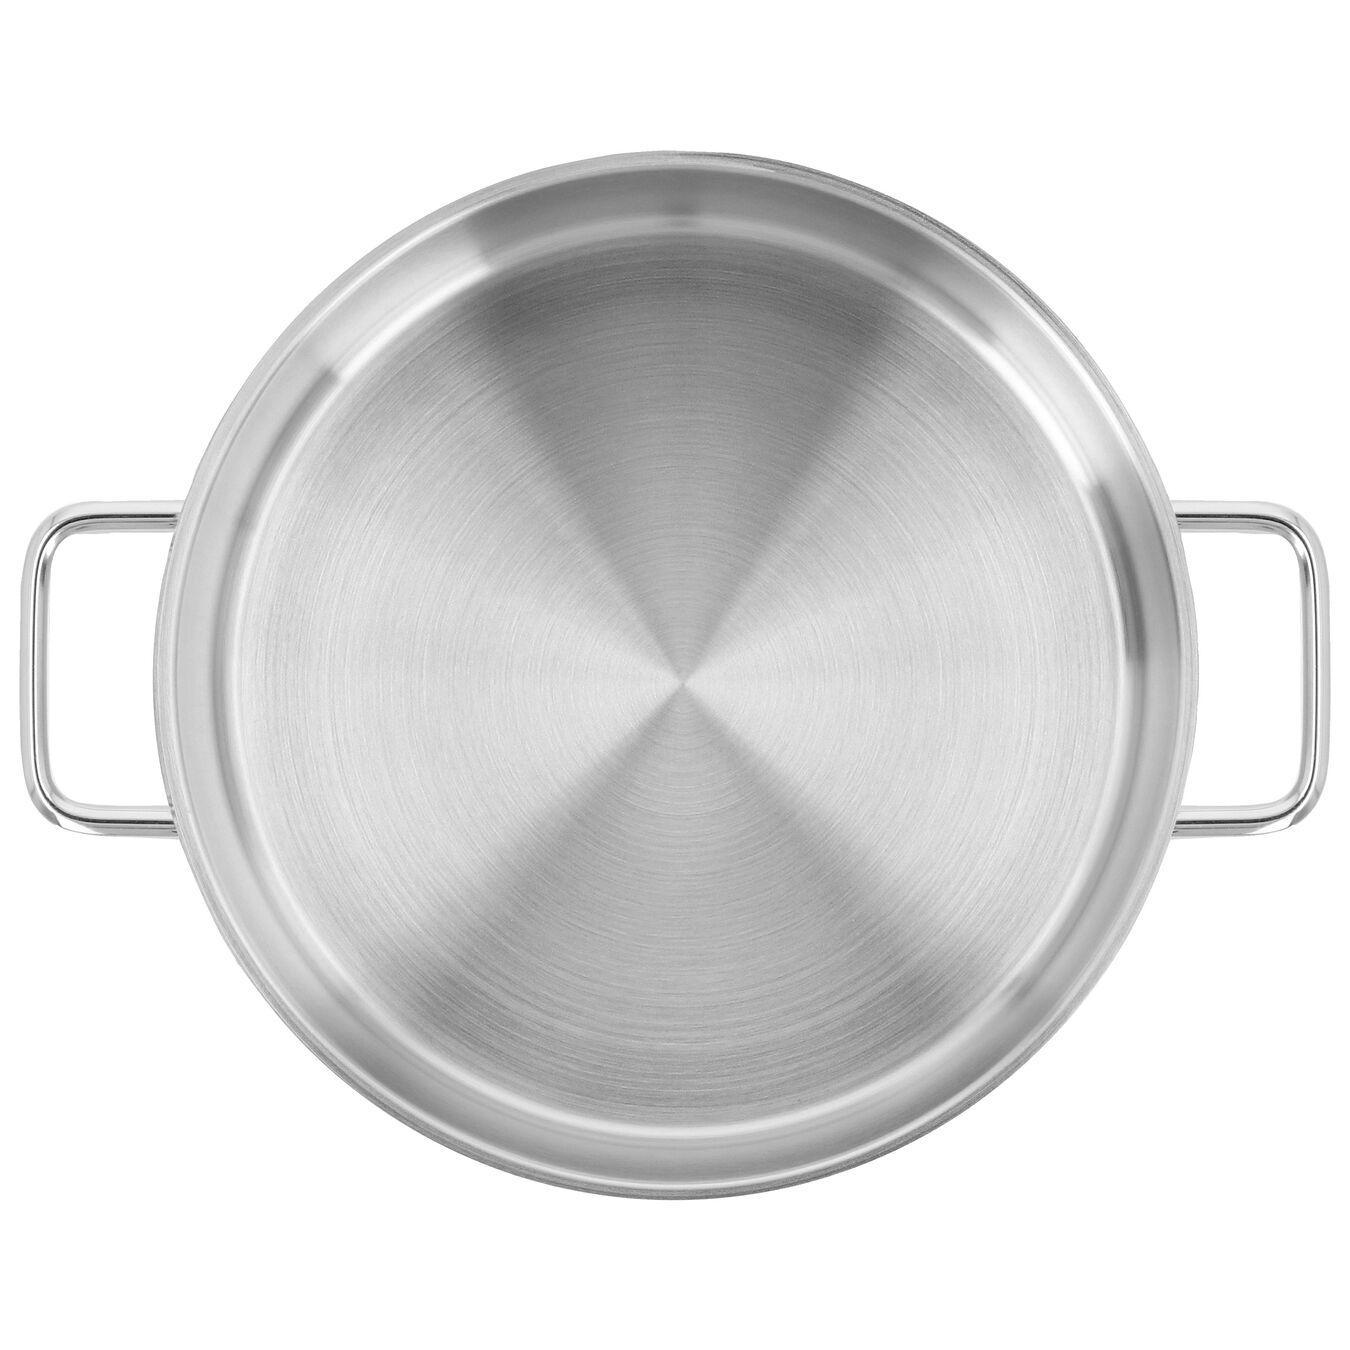 Kookpot met glazen deksel 24 cm / 2,8 l,,large 4